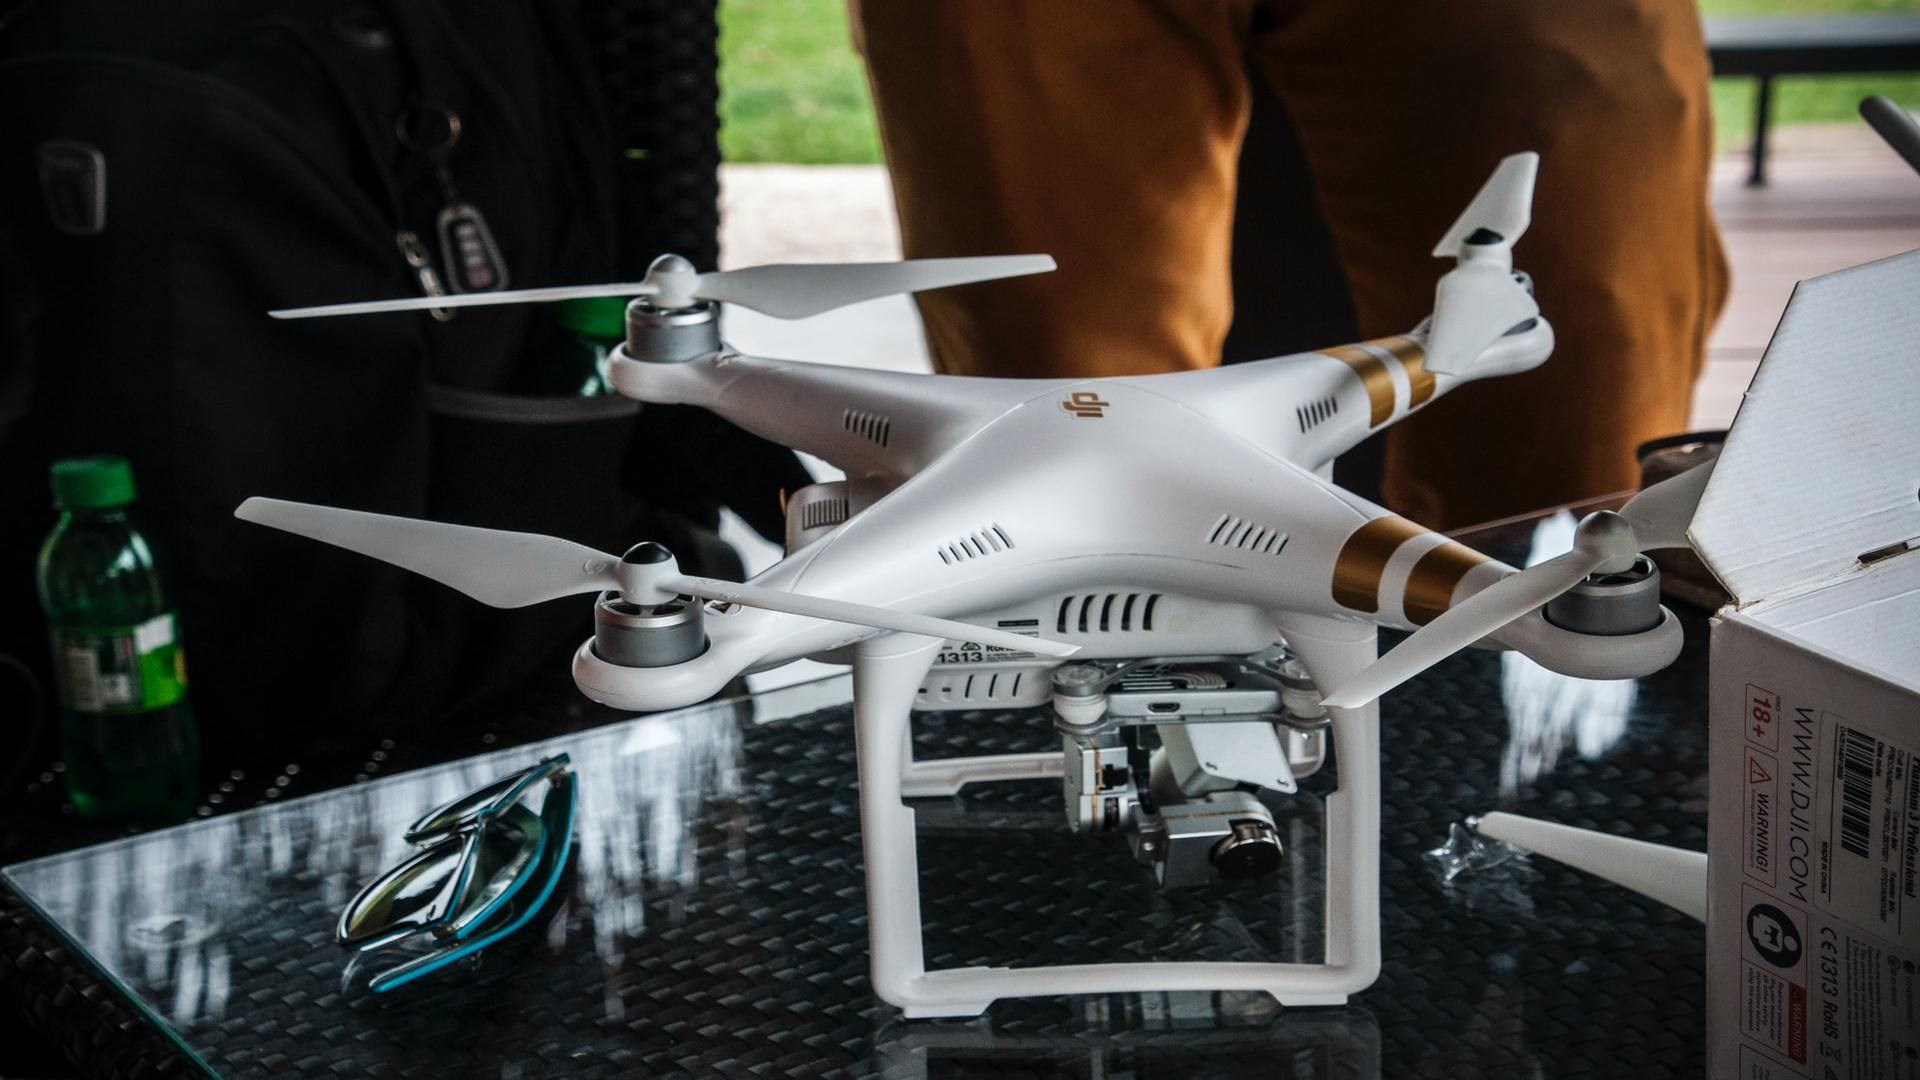 drones1920x1080